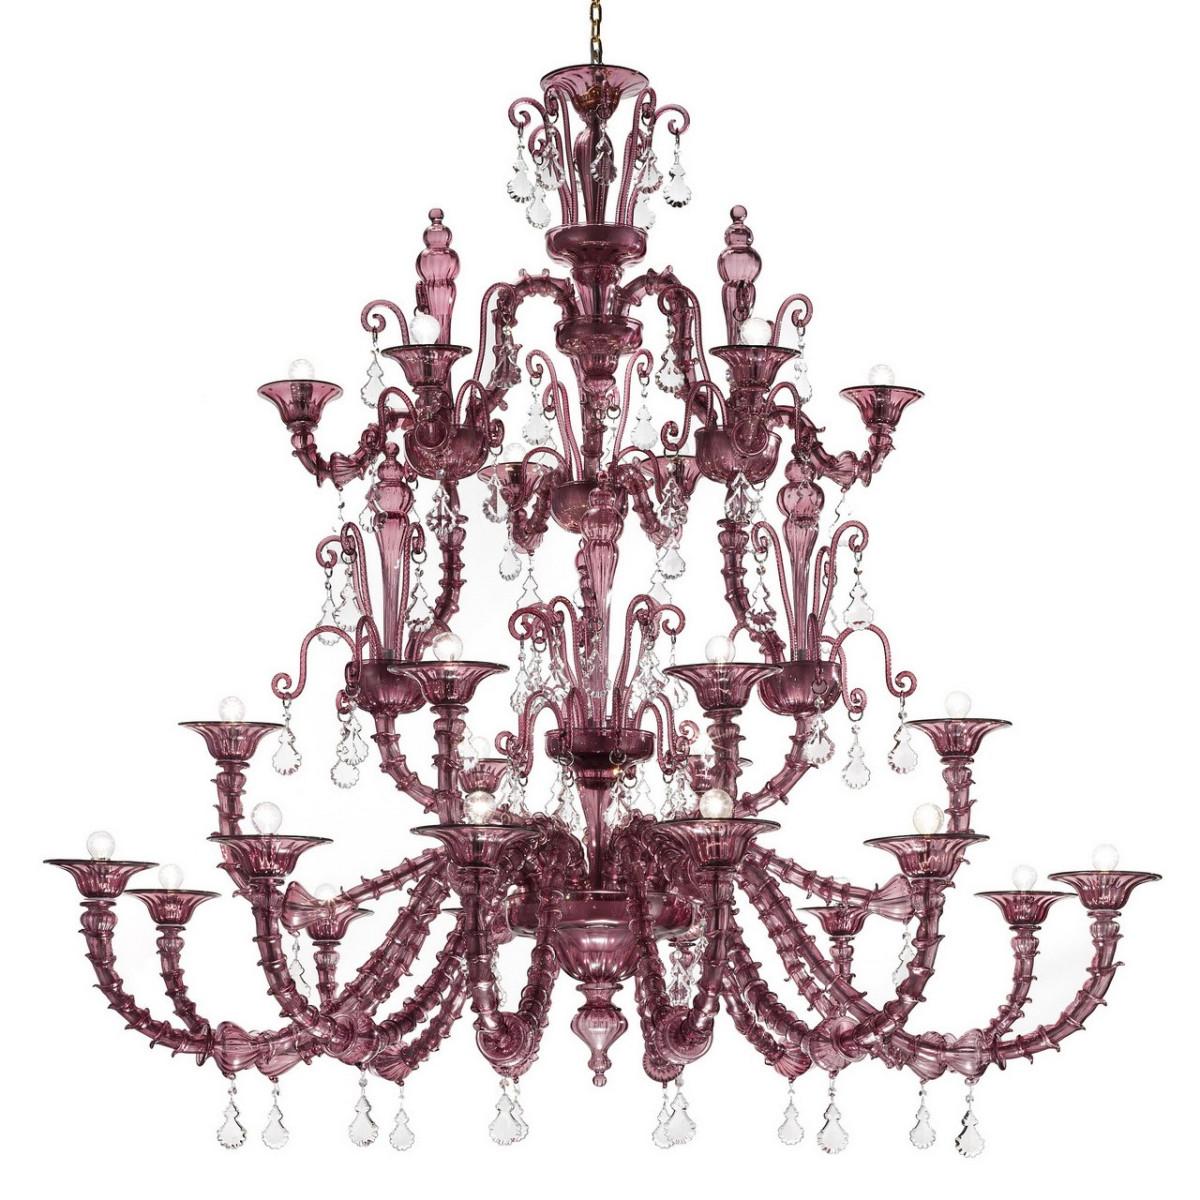 altea murano glas kronleuchter murano glass chandeliers. Black Bedroom Furniture Sets. Home Design Ideas